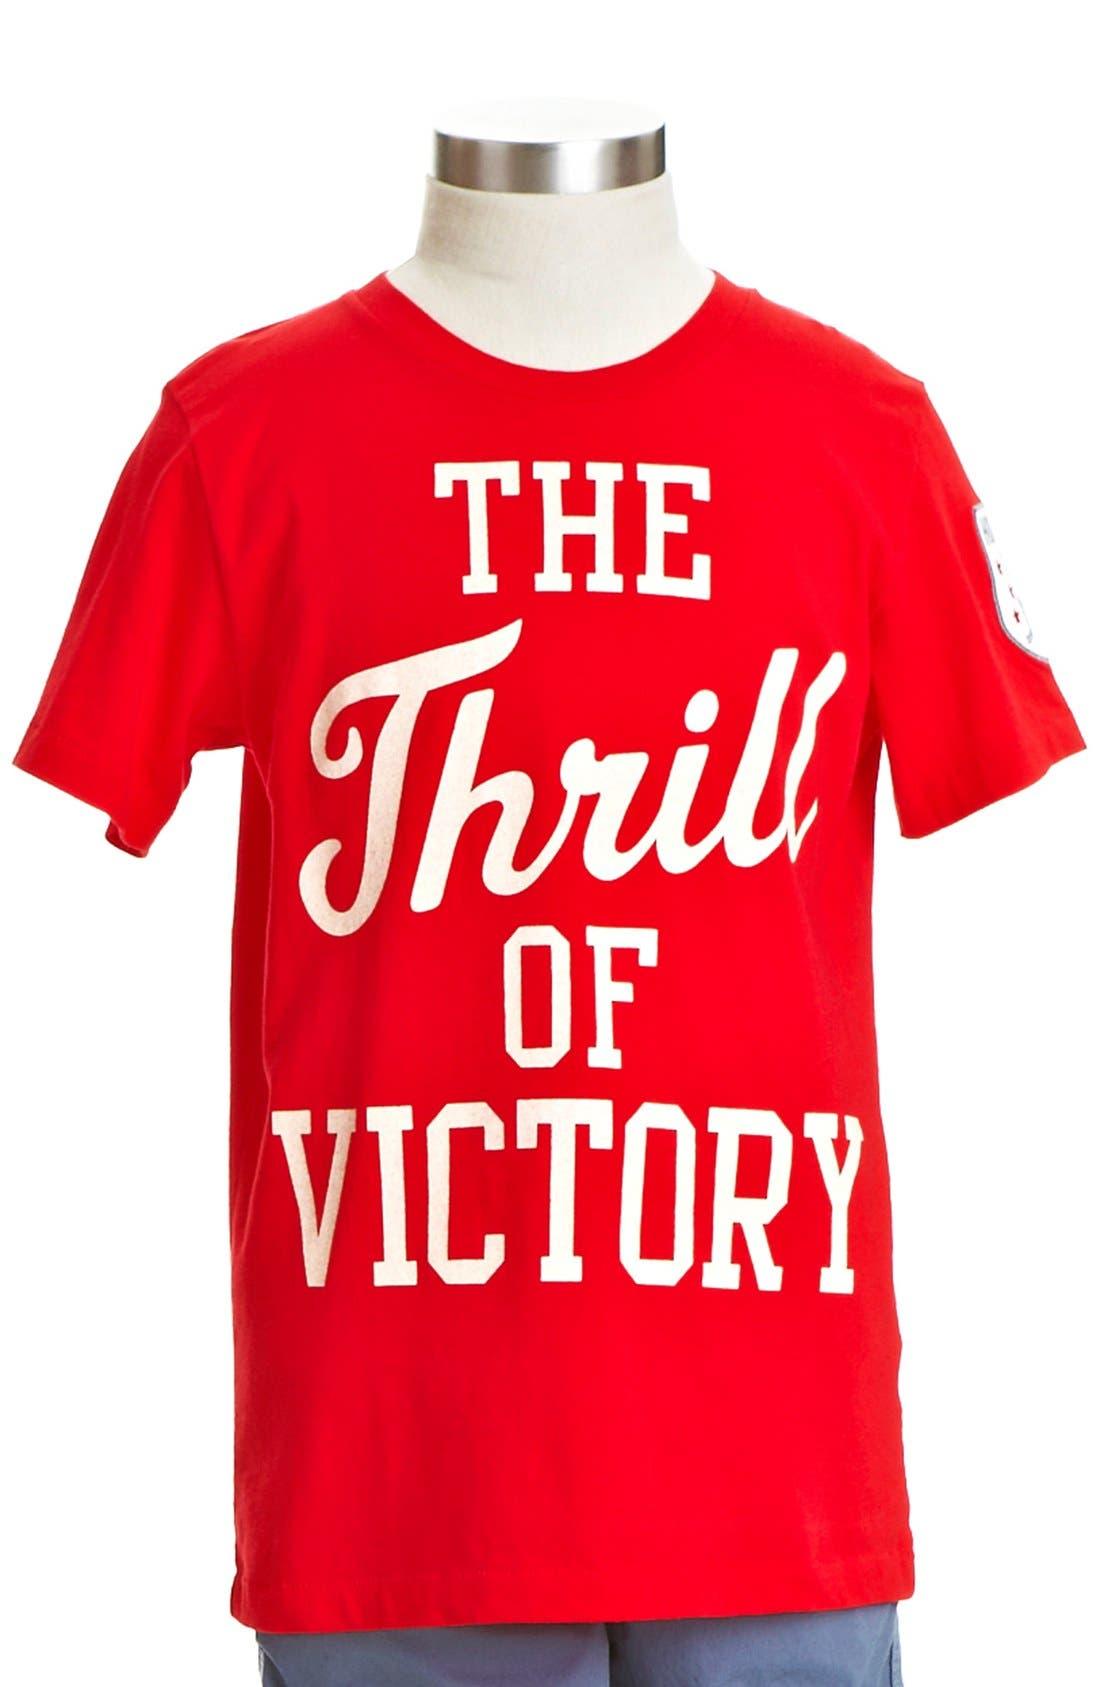 Alternate Image 1 Selected - Peek 'Thrill of Victory' T-Shirt (Toddler Boys, Little Boys & Big Boys)